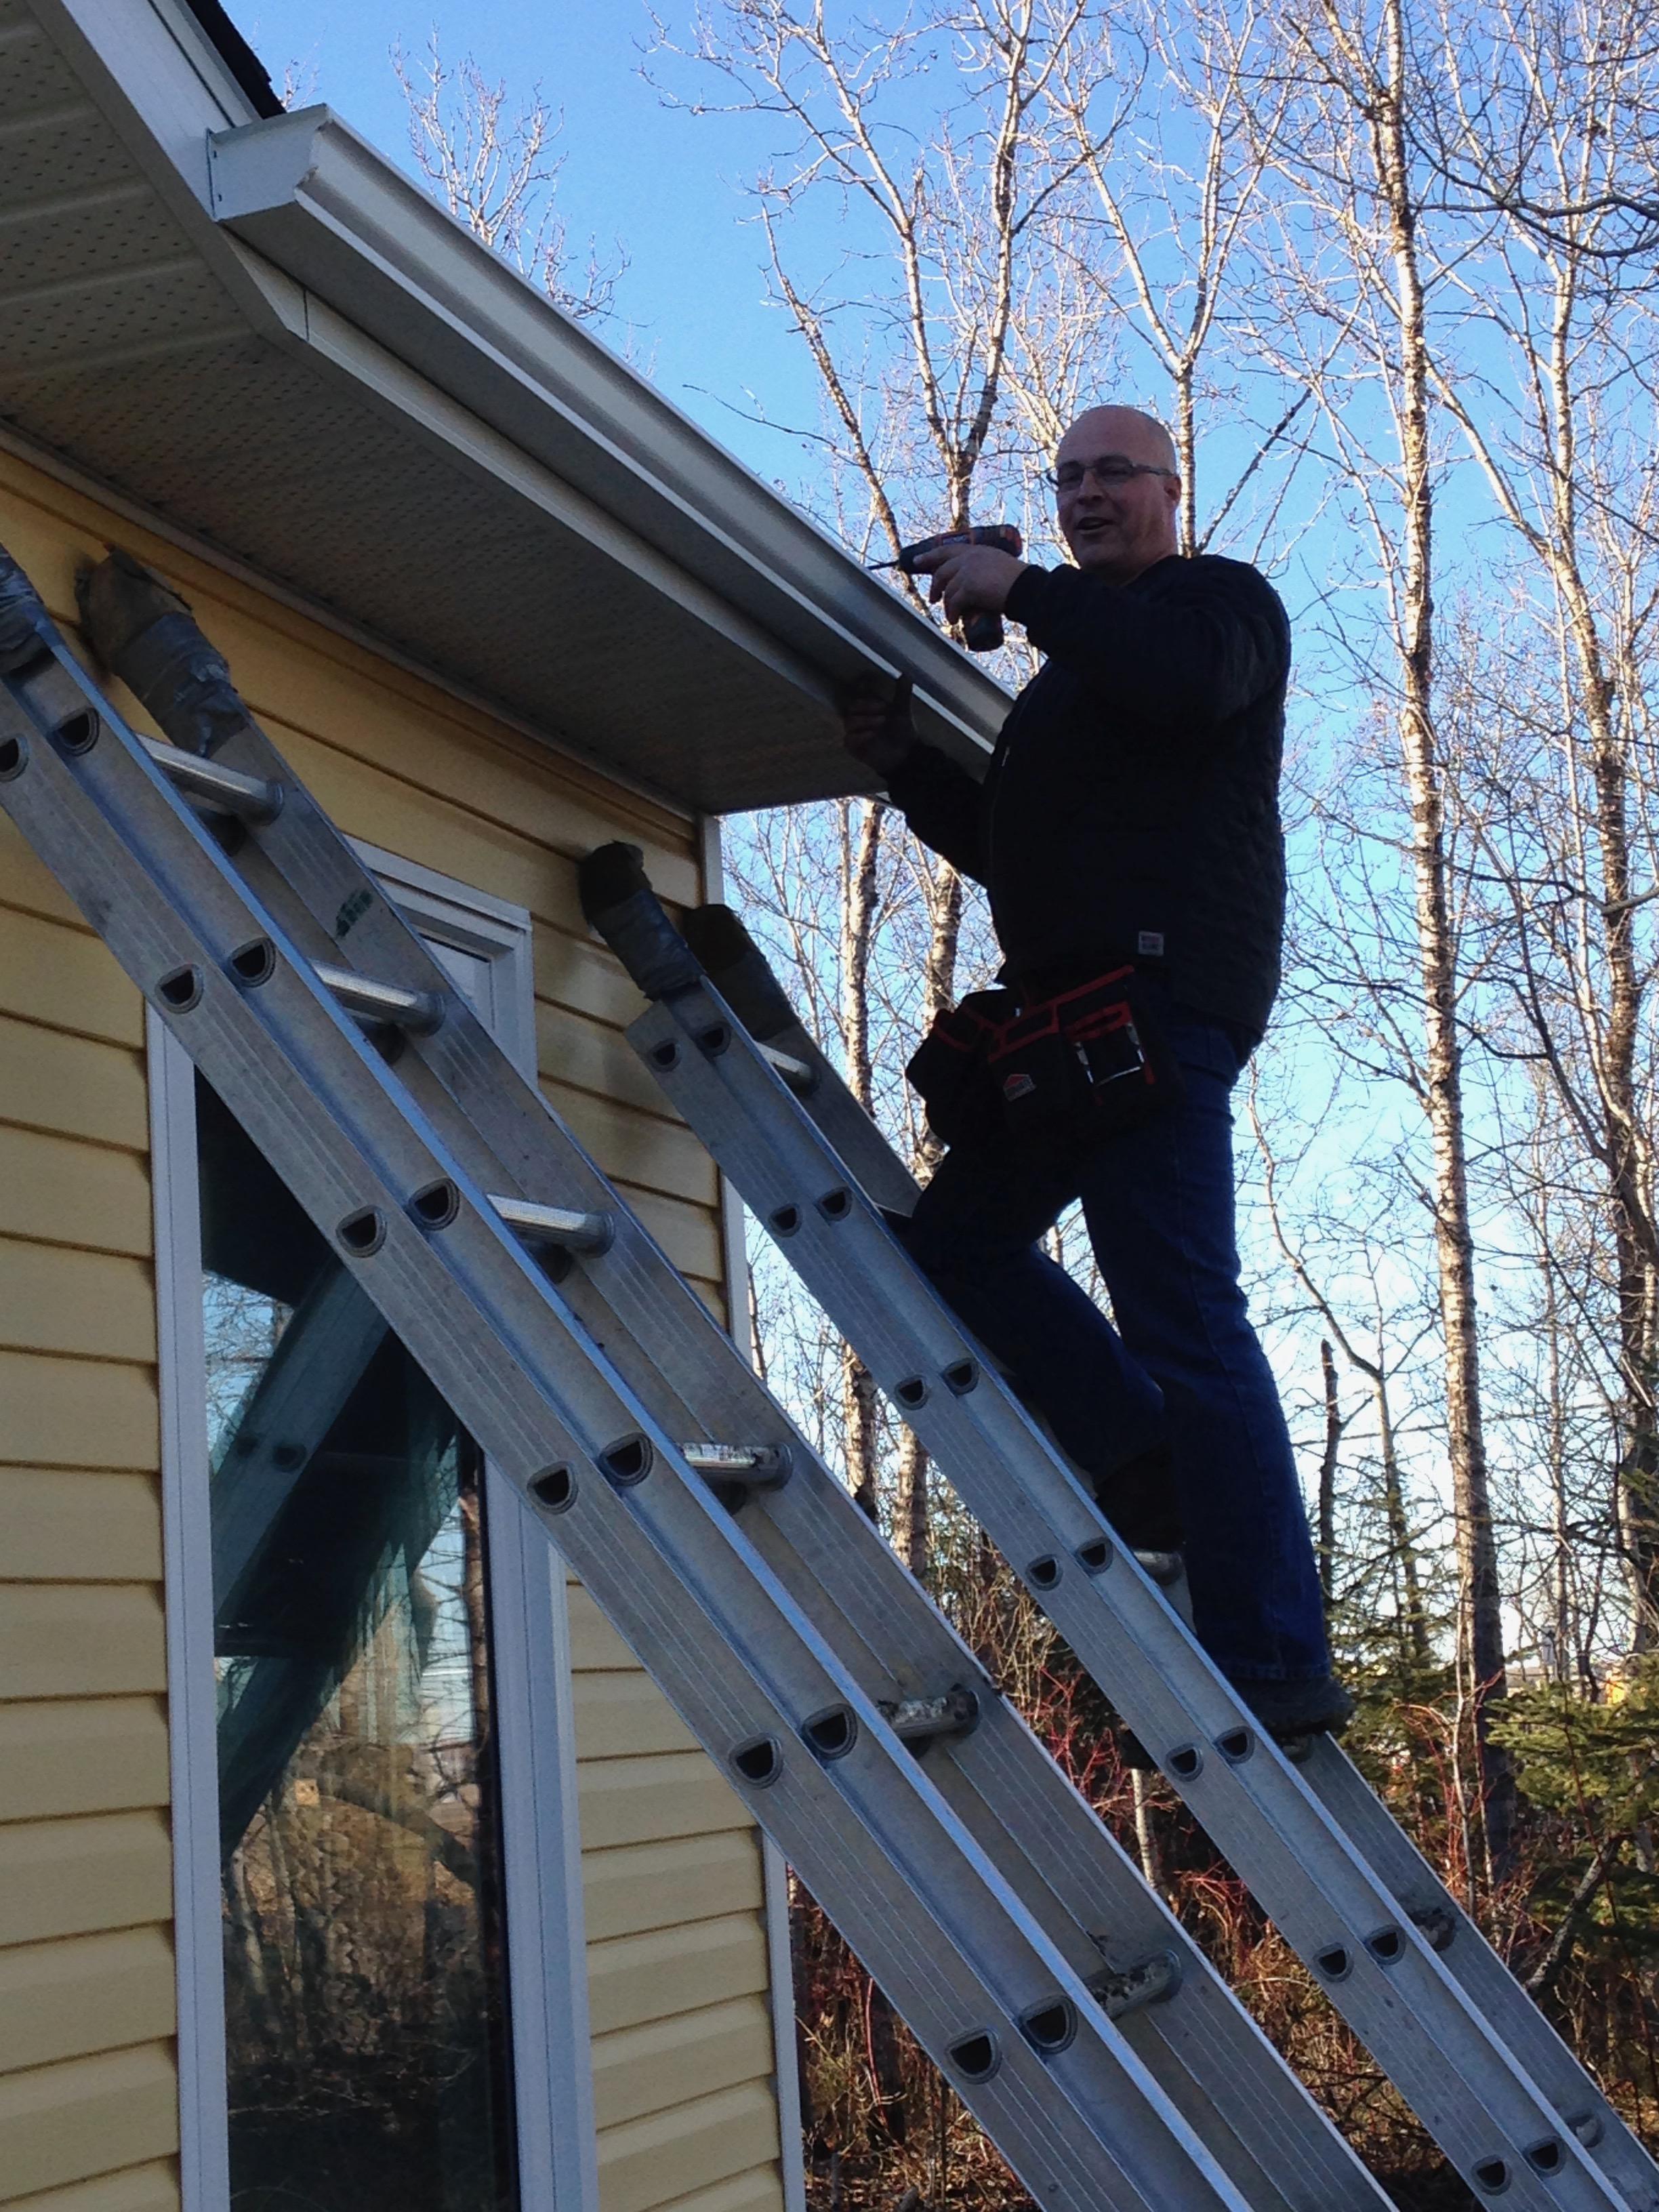 Eavestrough 2 - Dugard Plumbing, Heating & Cooling